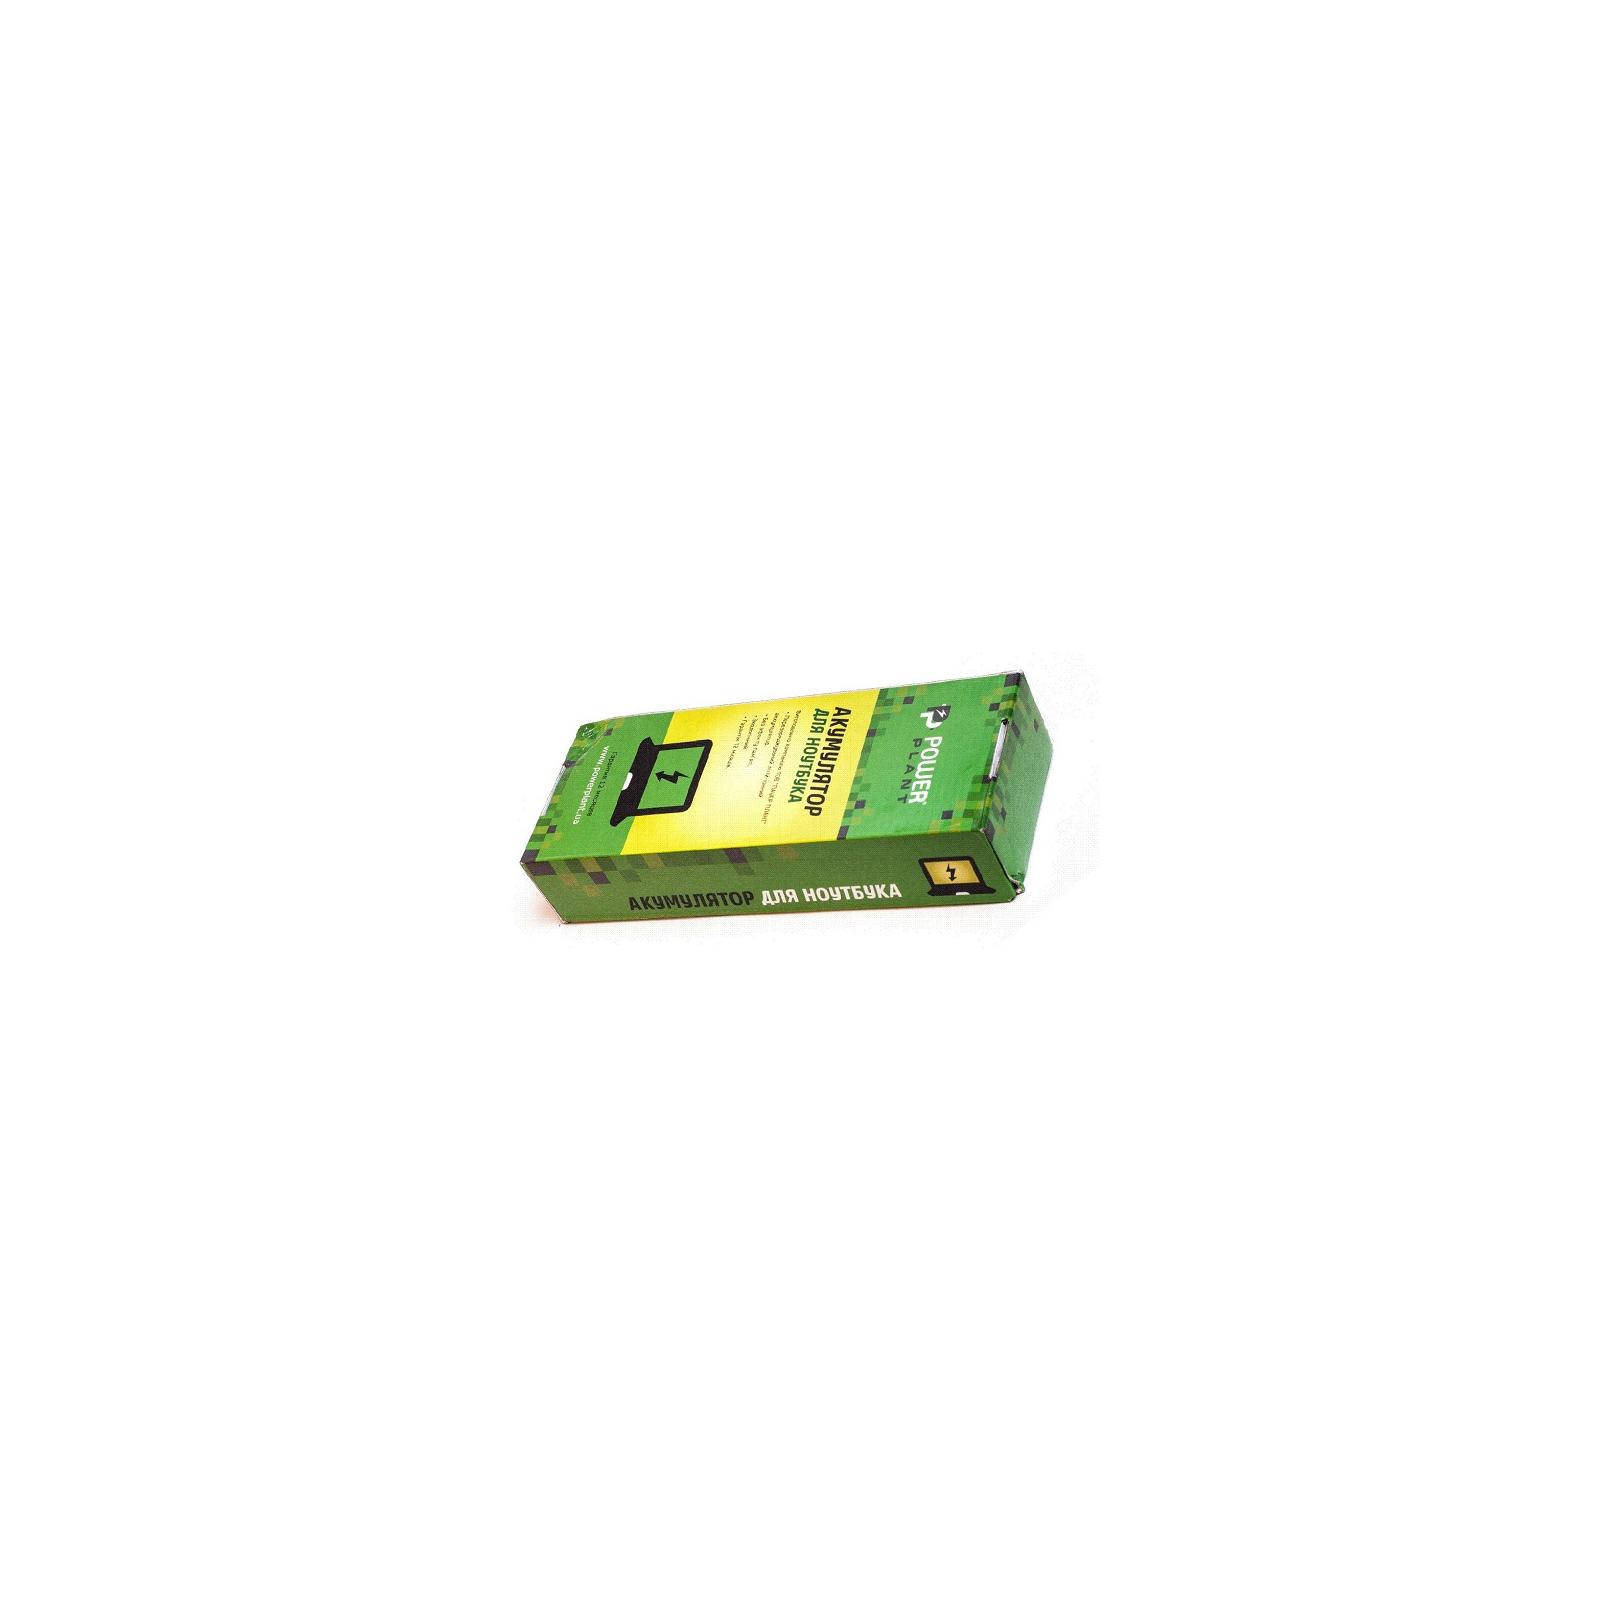 Аккумулятор для ноутбука HP EliteBook 8530 (HSTNN-LB60, H8530) 14.4V 5200mAh PowerPlant (NB00000127) изображение 3